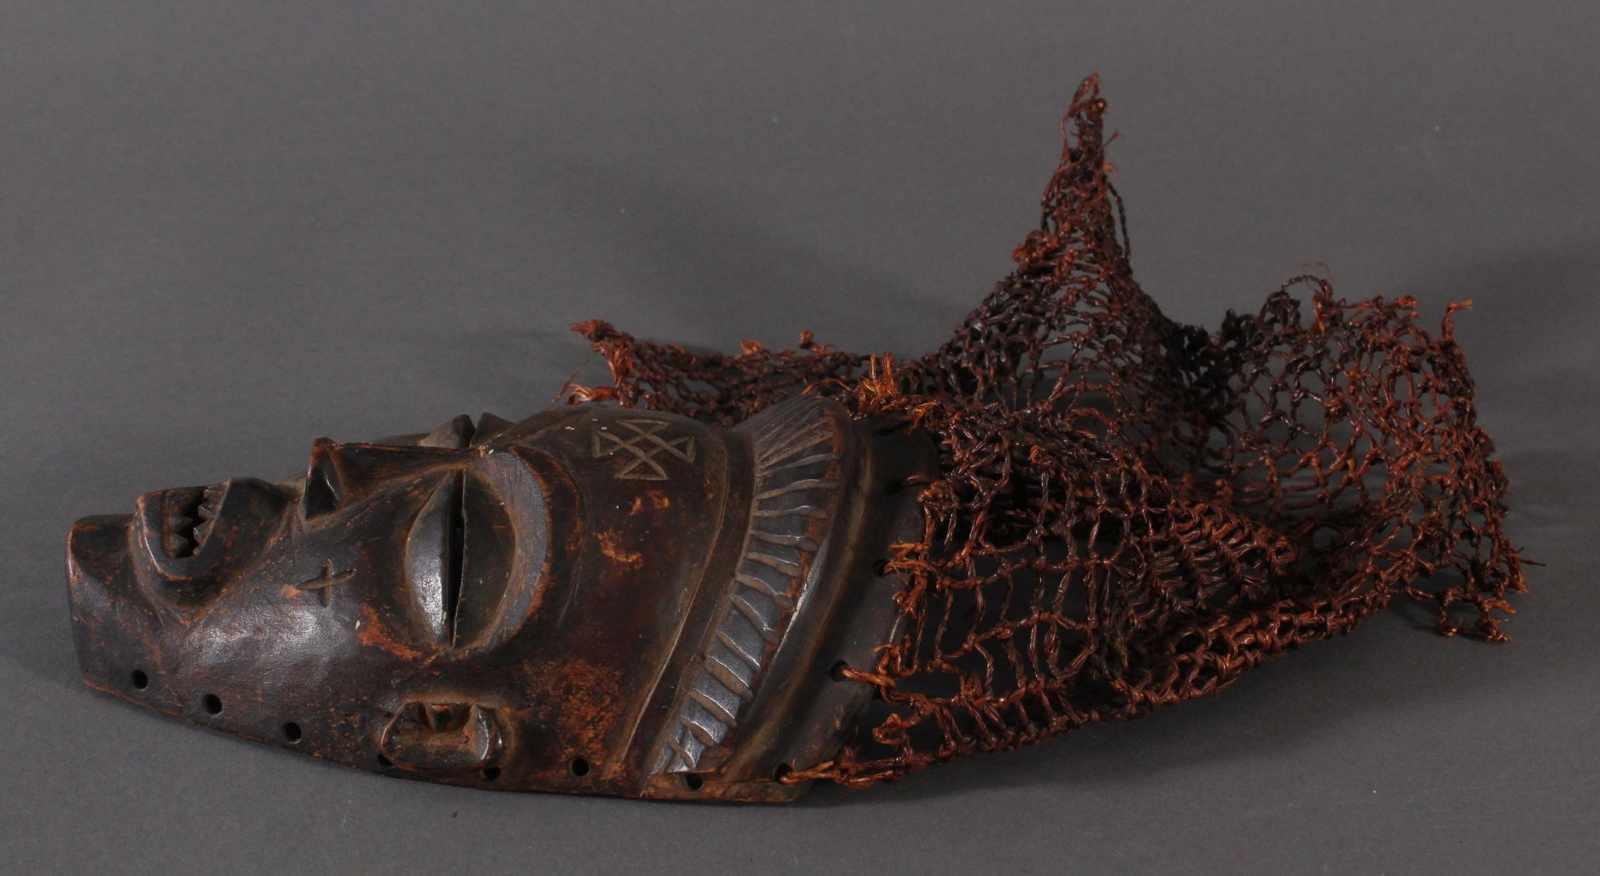 Antike Maske, Chokwe, Kongo 1.Hälfte 20. Jh.Holz geschnitzt, dunkle Patina, Narbenschmuck, - Bild 3 aus 4